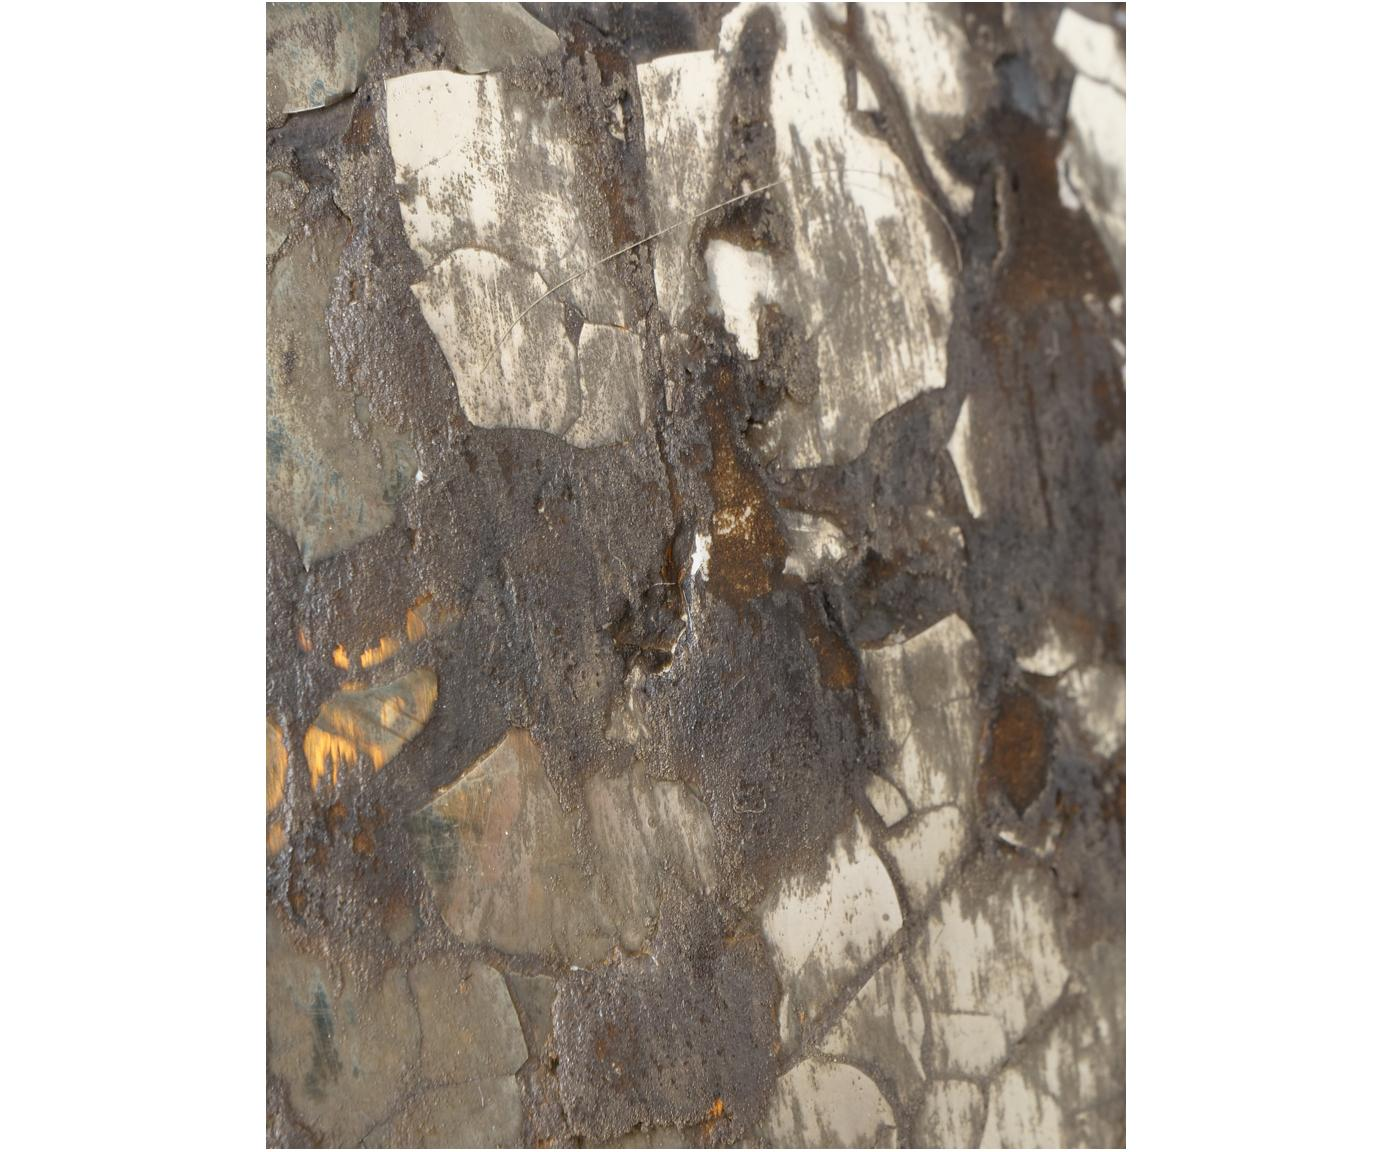 Set 2 portacandele Kyritz, Vetro, Marrone, argento con finitura anticata, Ø 12 x Alt. 13 cm